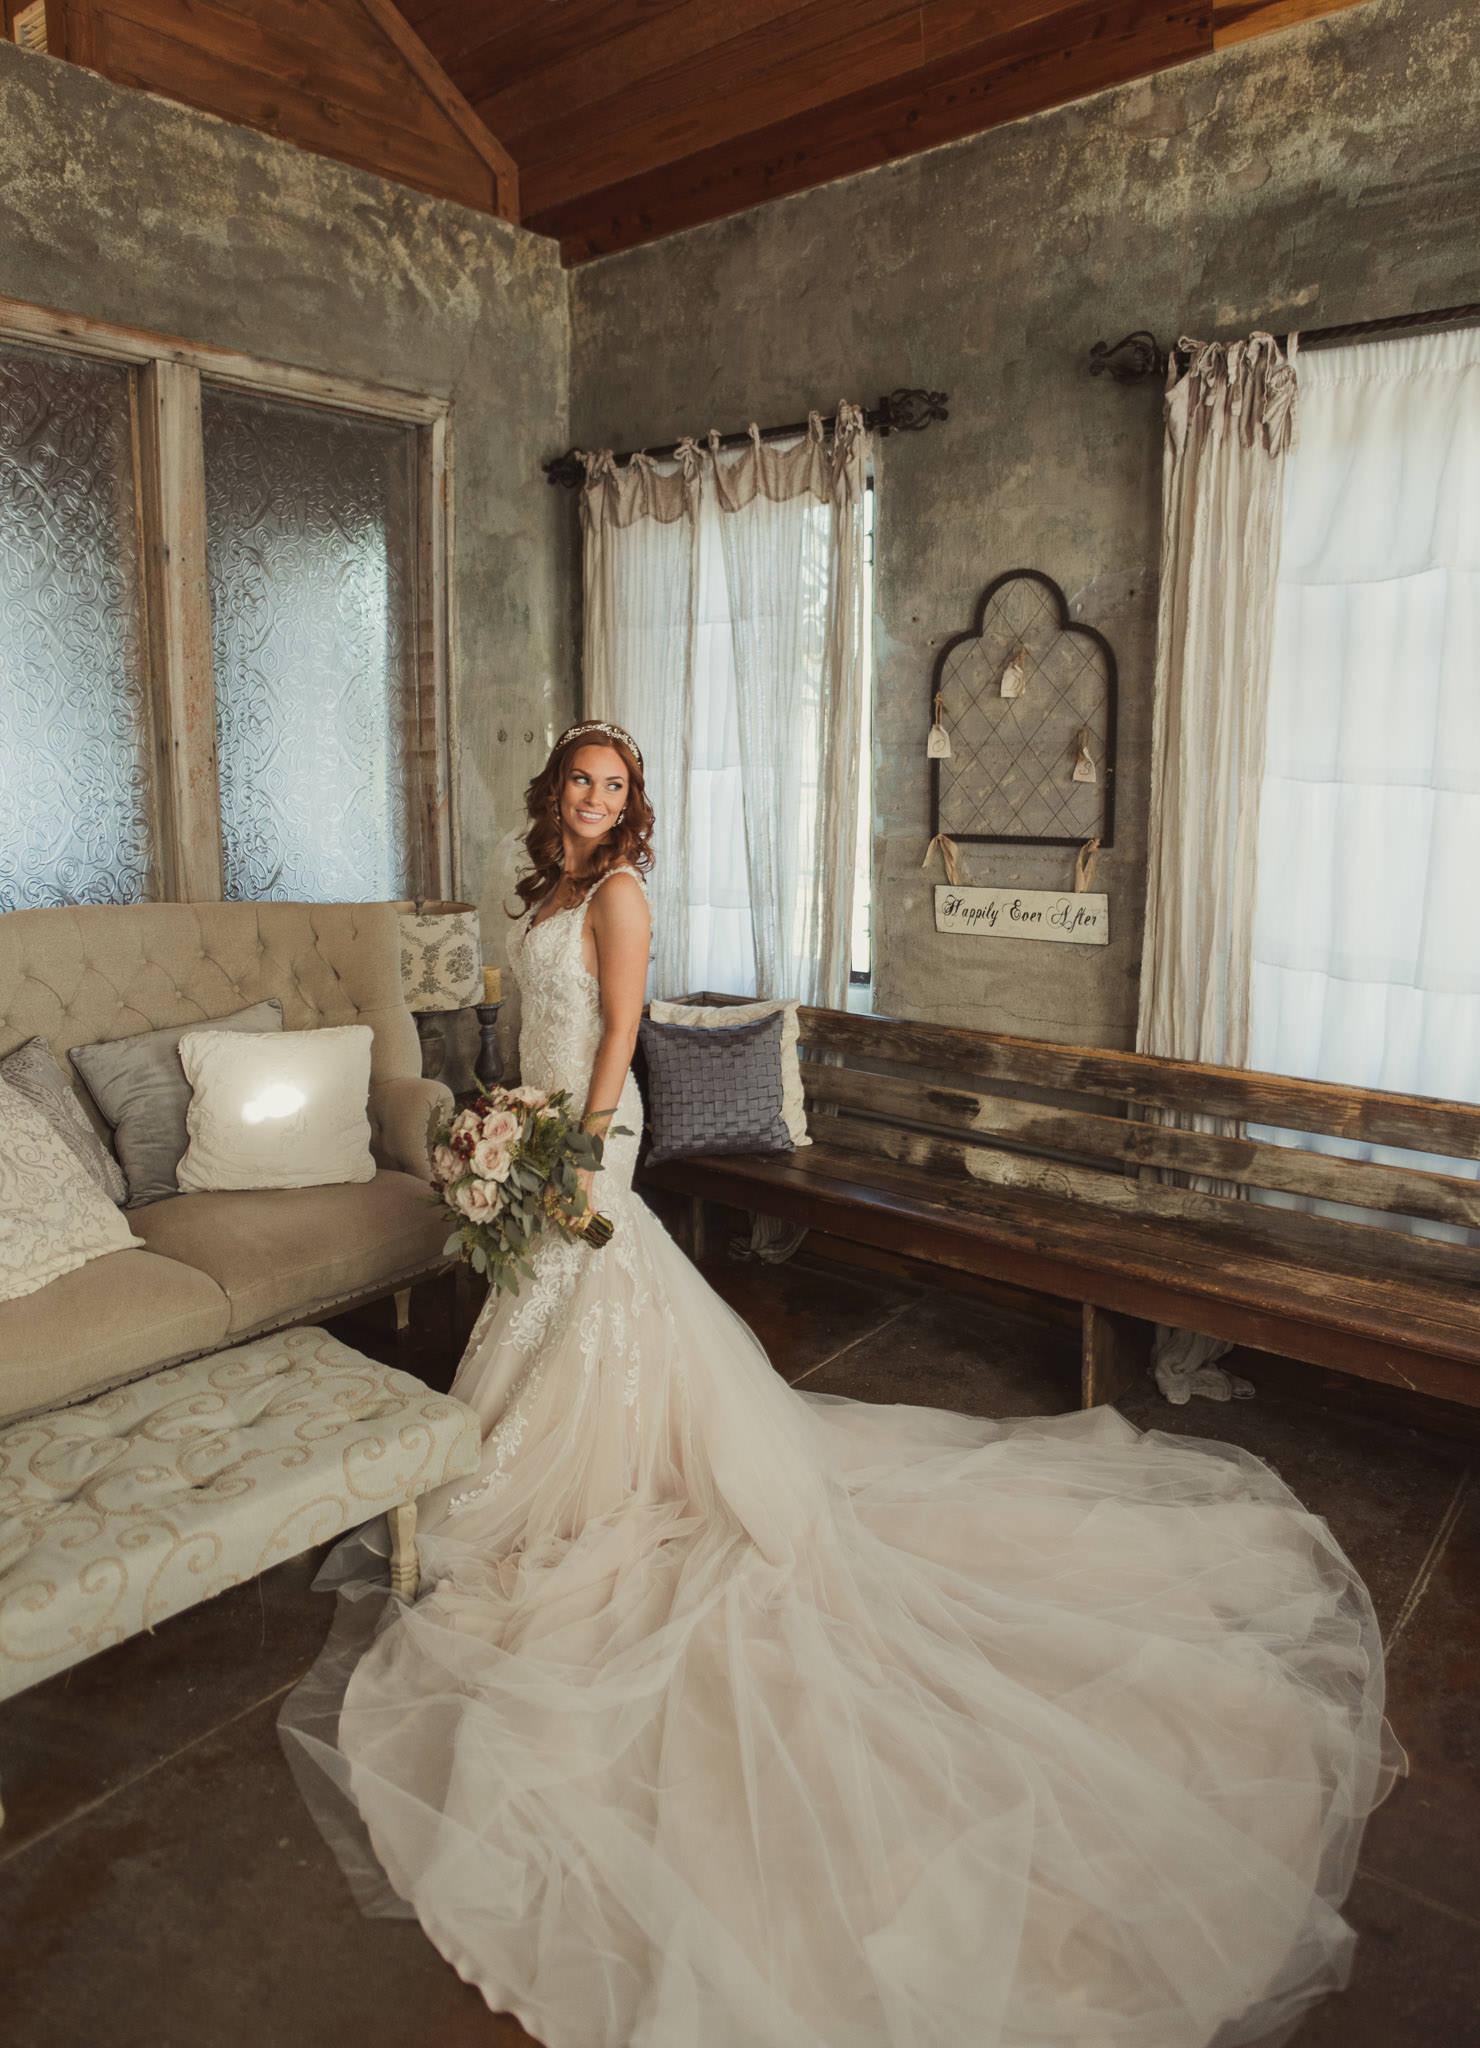 Cynthia-Curtis-Olde-Dobbine-Station-Houston-Wedding-Photographer-sm-36.jpg